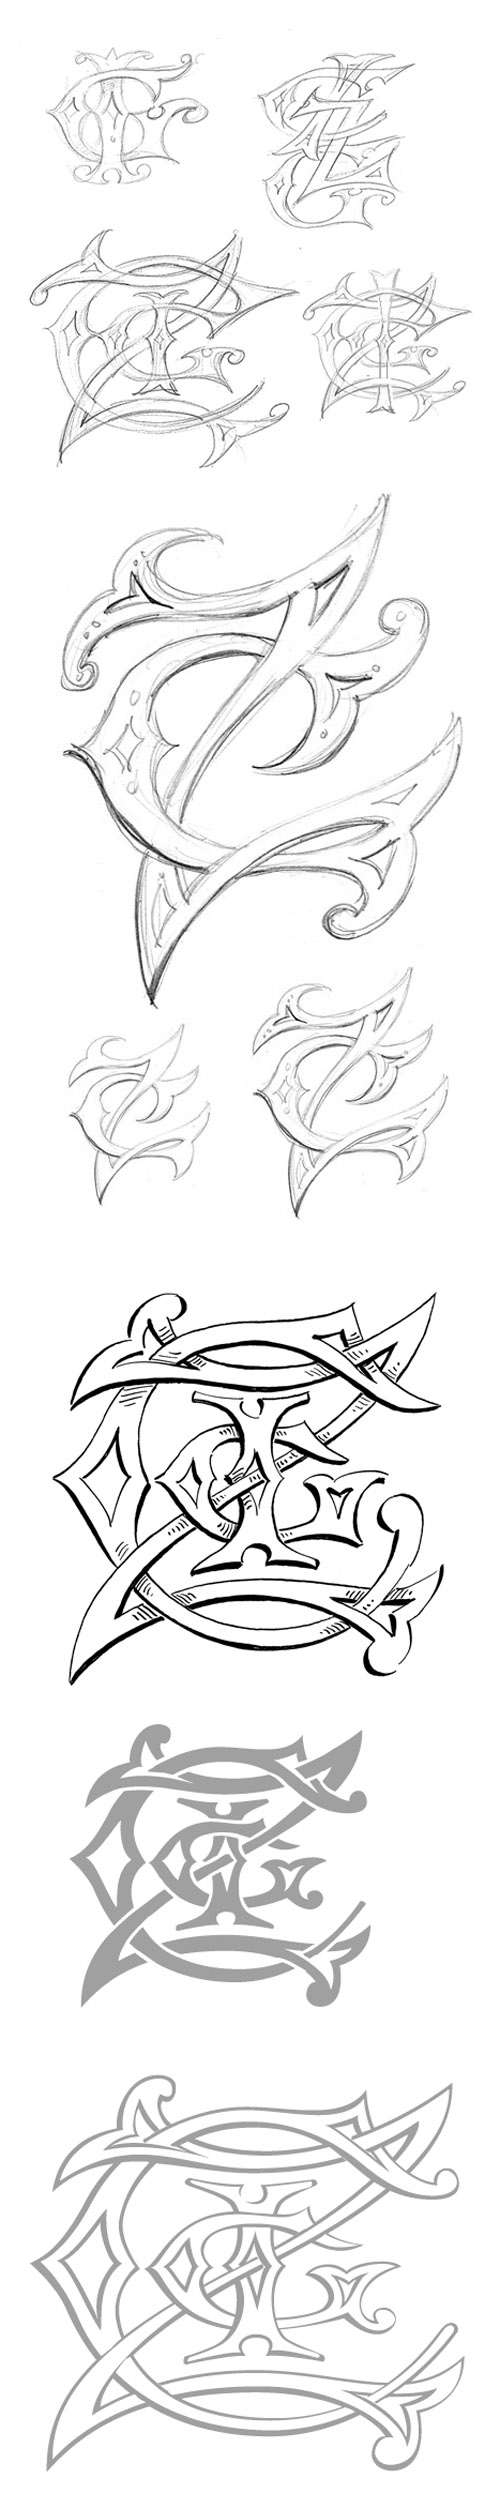 4 letter wedding monogram from michelle rago and pier gustafson junebugweddingscom